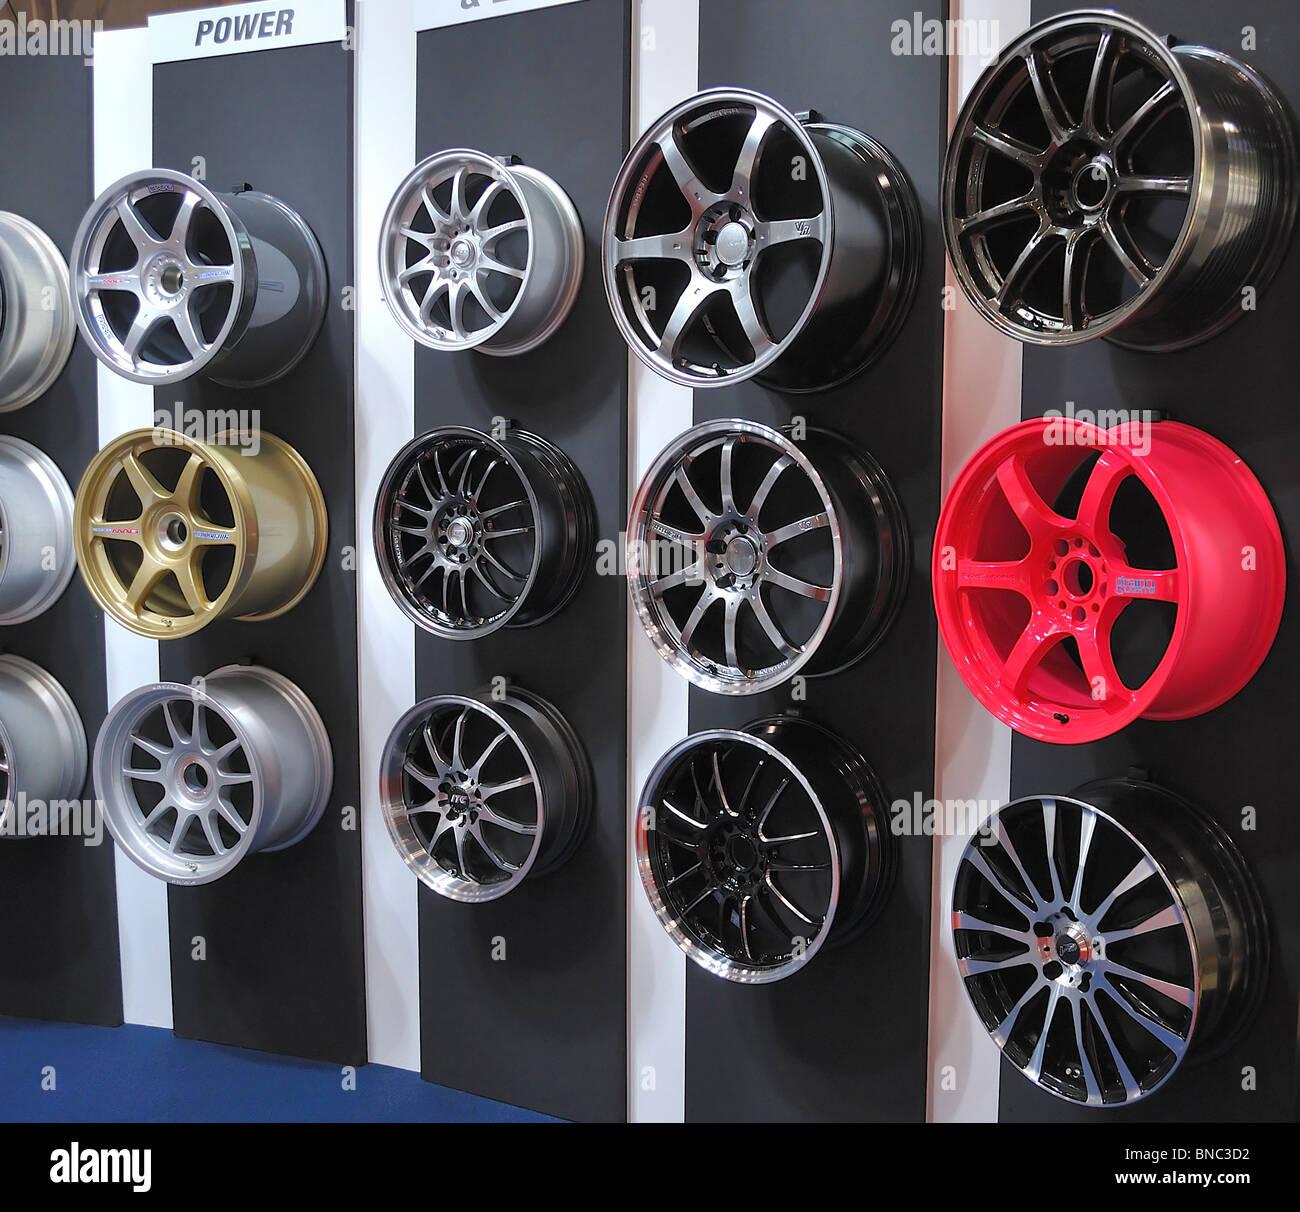 12 Wheels Stock Photos & 12 Wheels Stock Images - Alamy